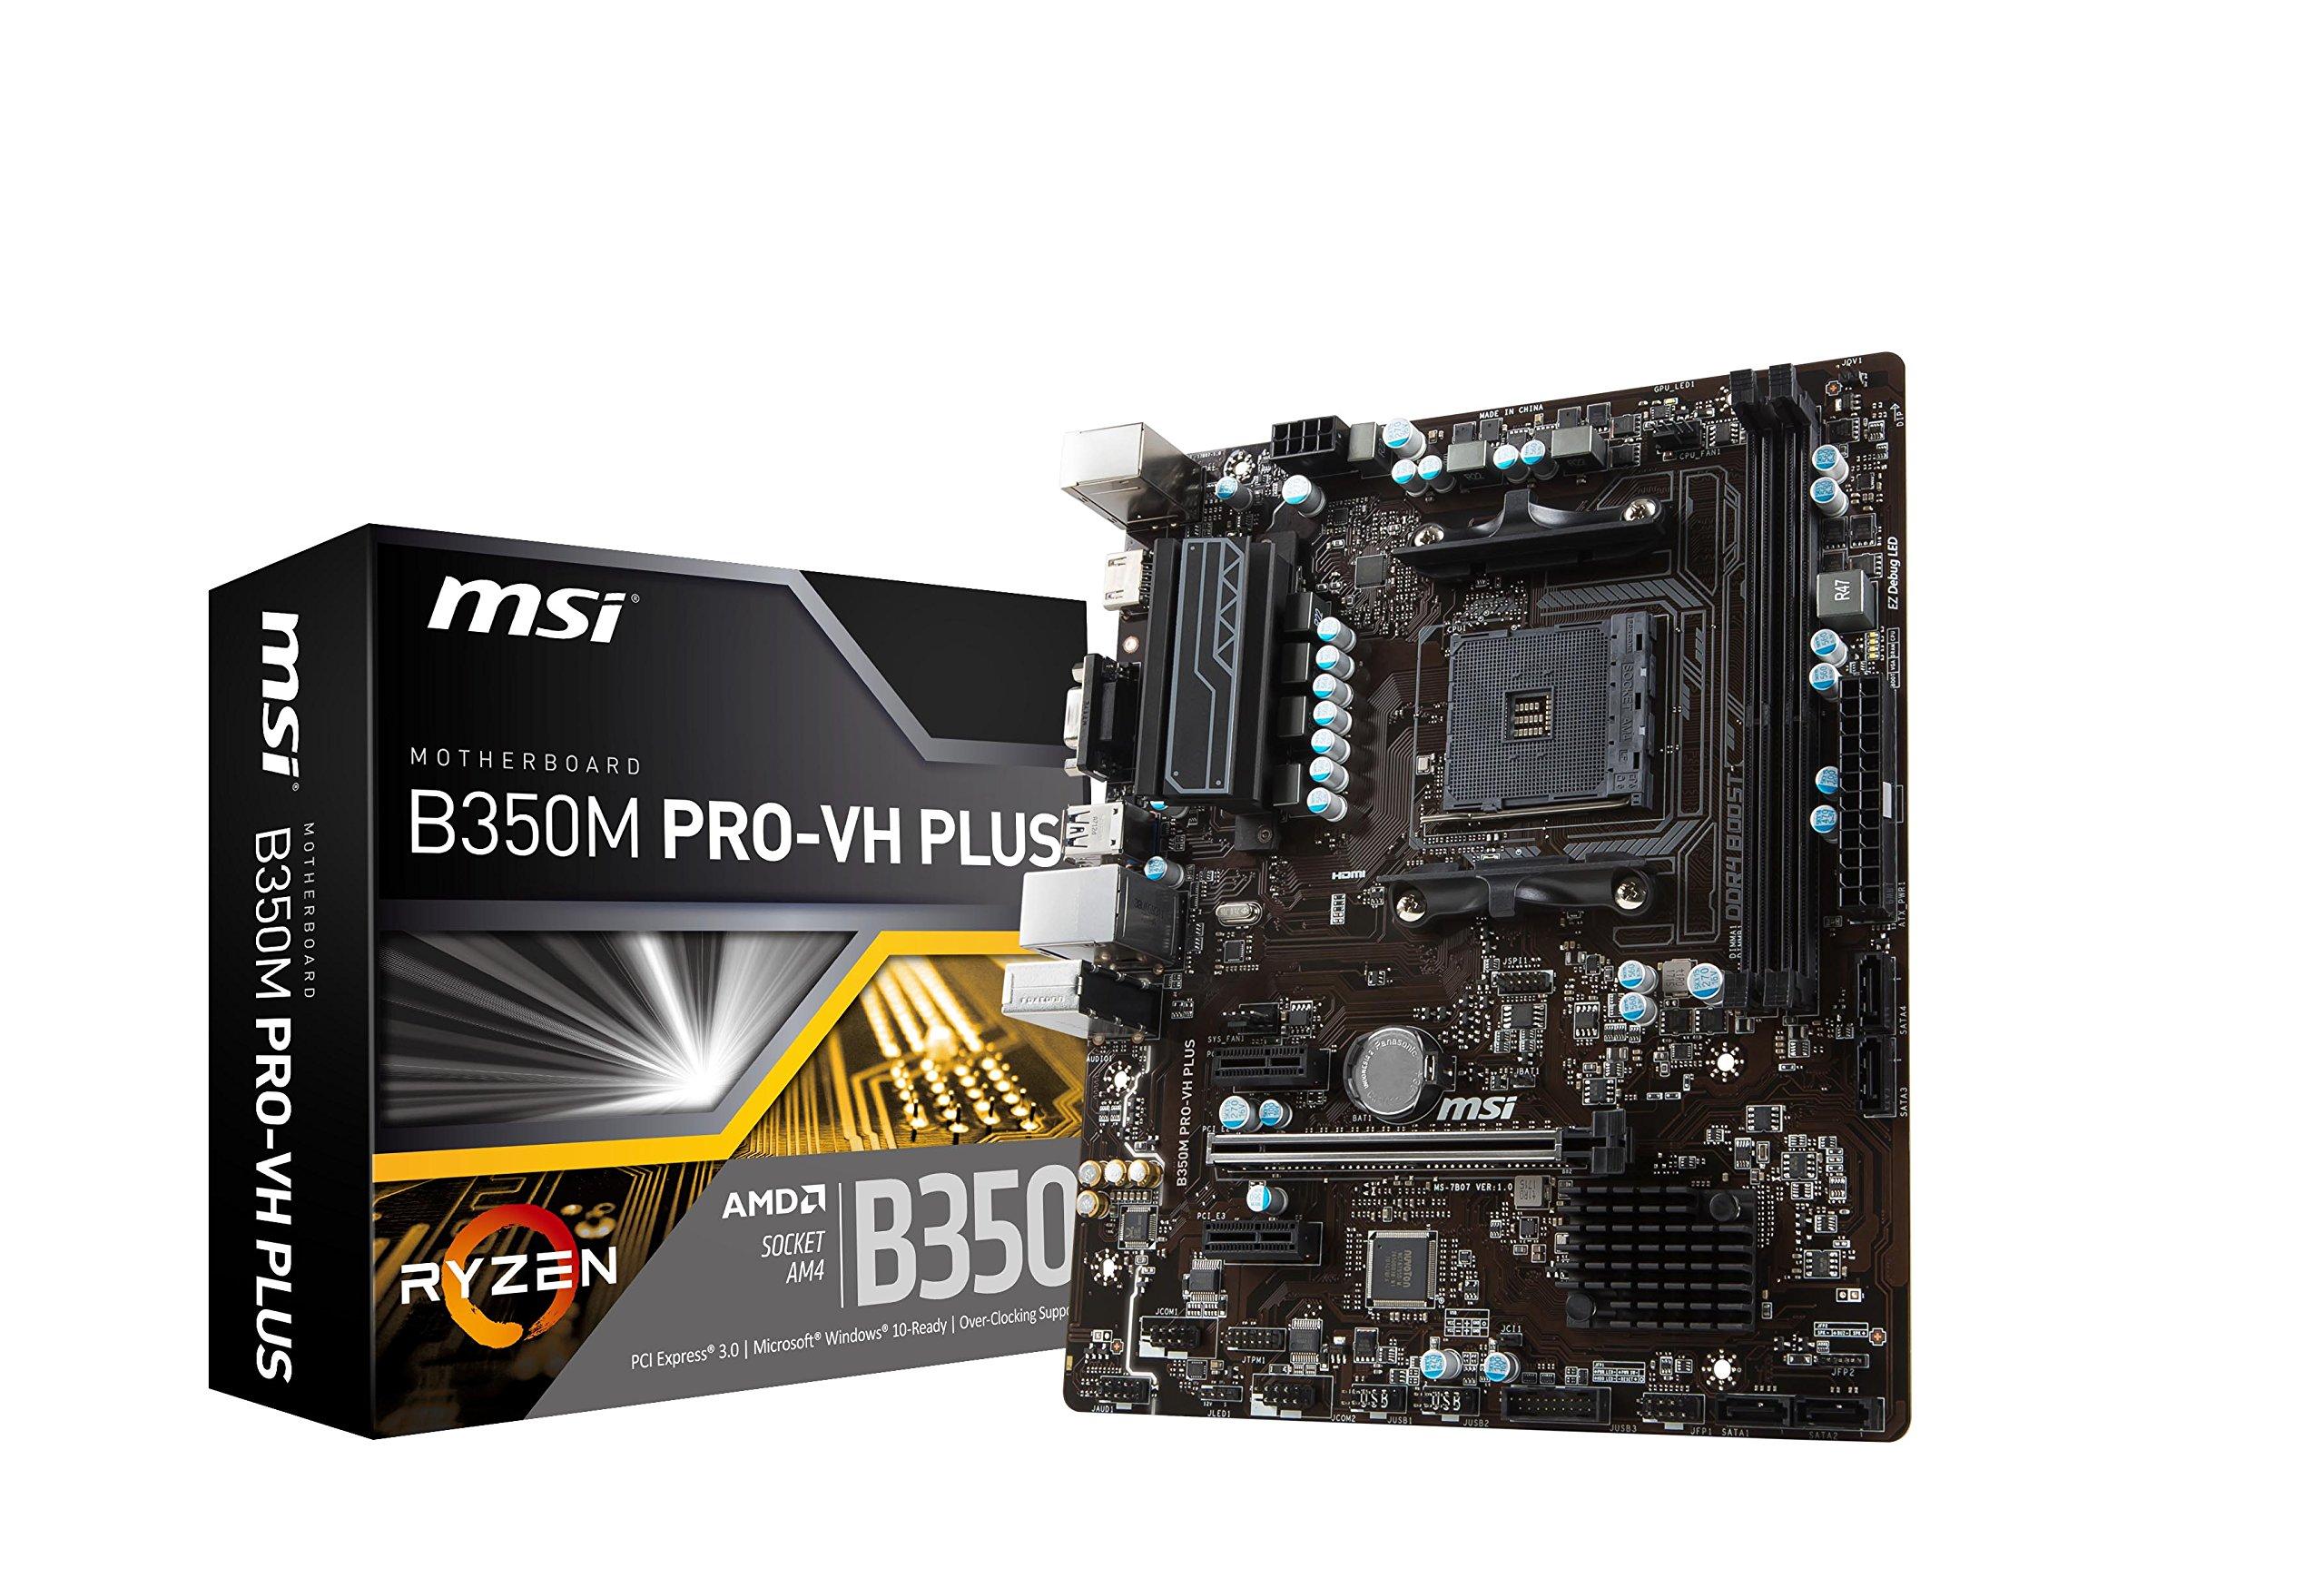 MSI B350M-PRO-VH-PLUS Motherboards